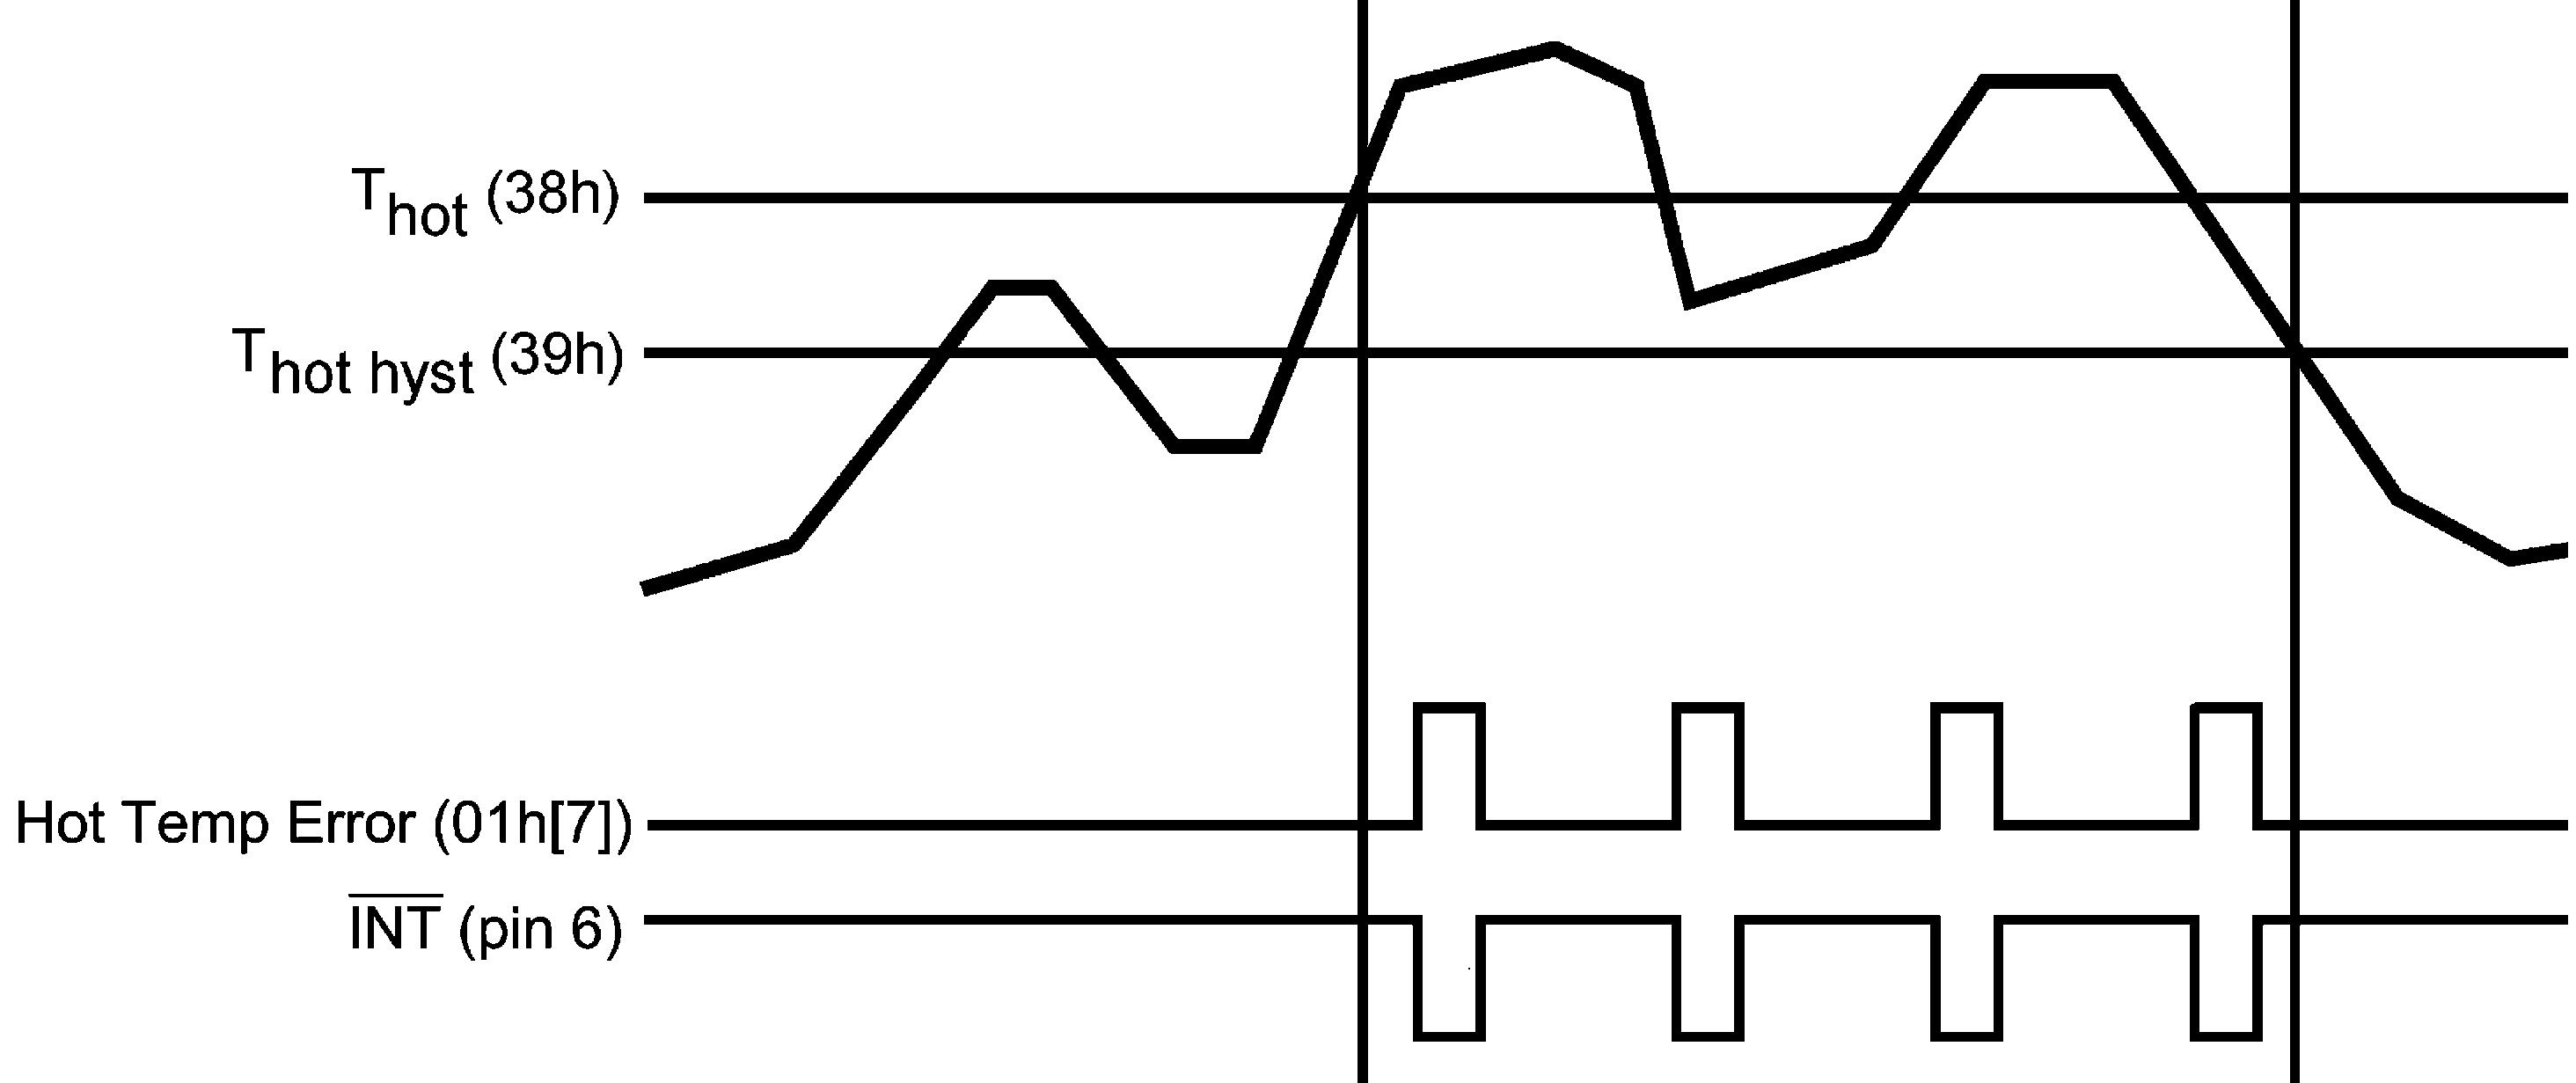 Adc128d818 Voltdividercircuitdiagramgif 3190 Bytes 30096317